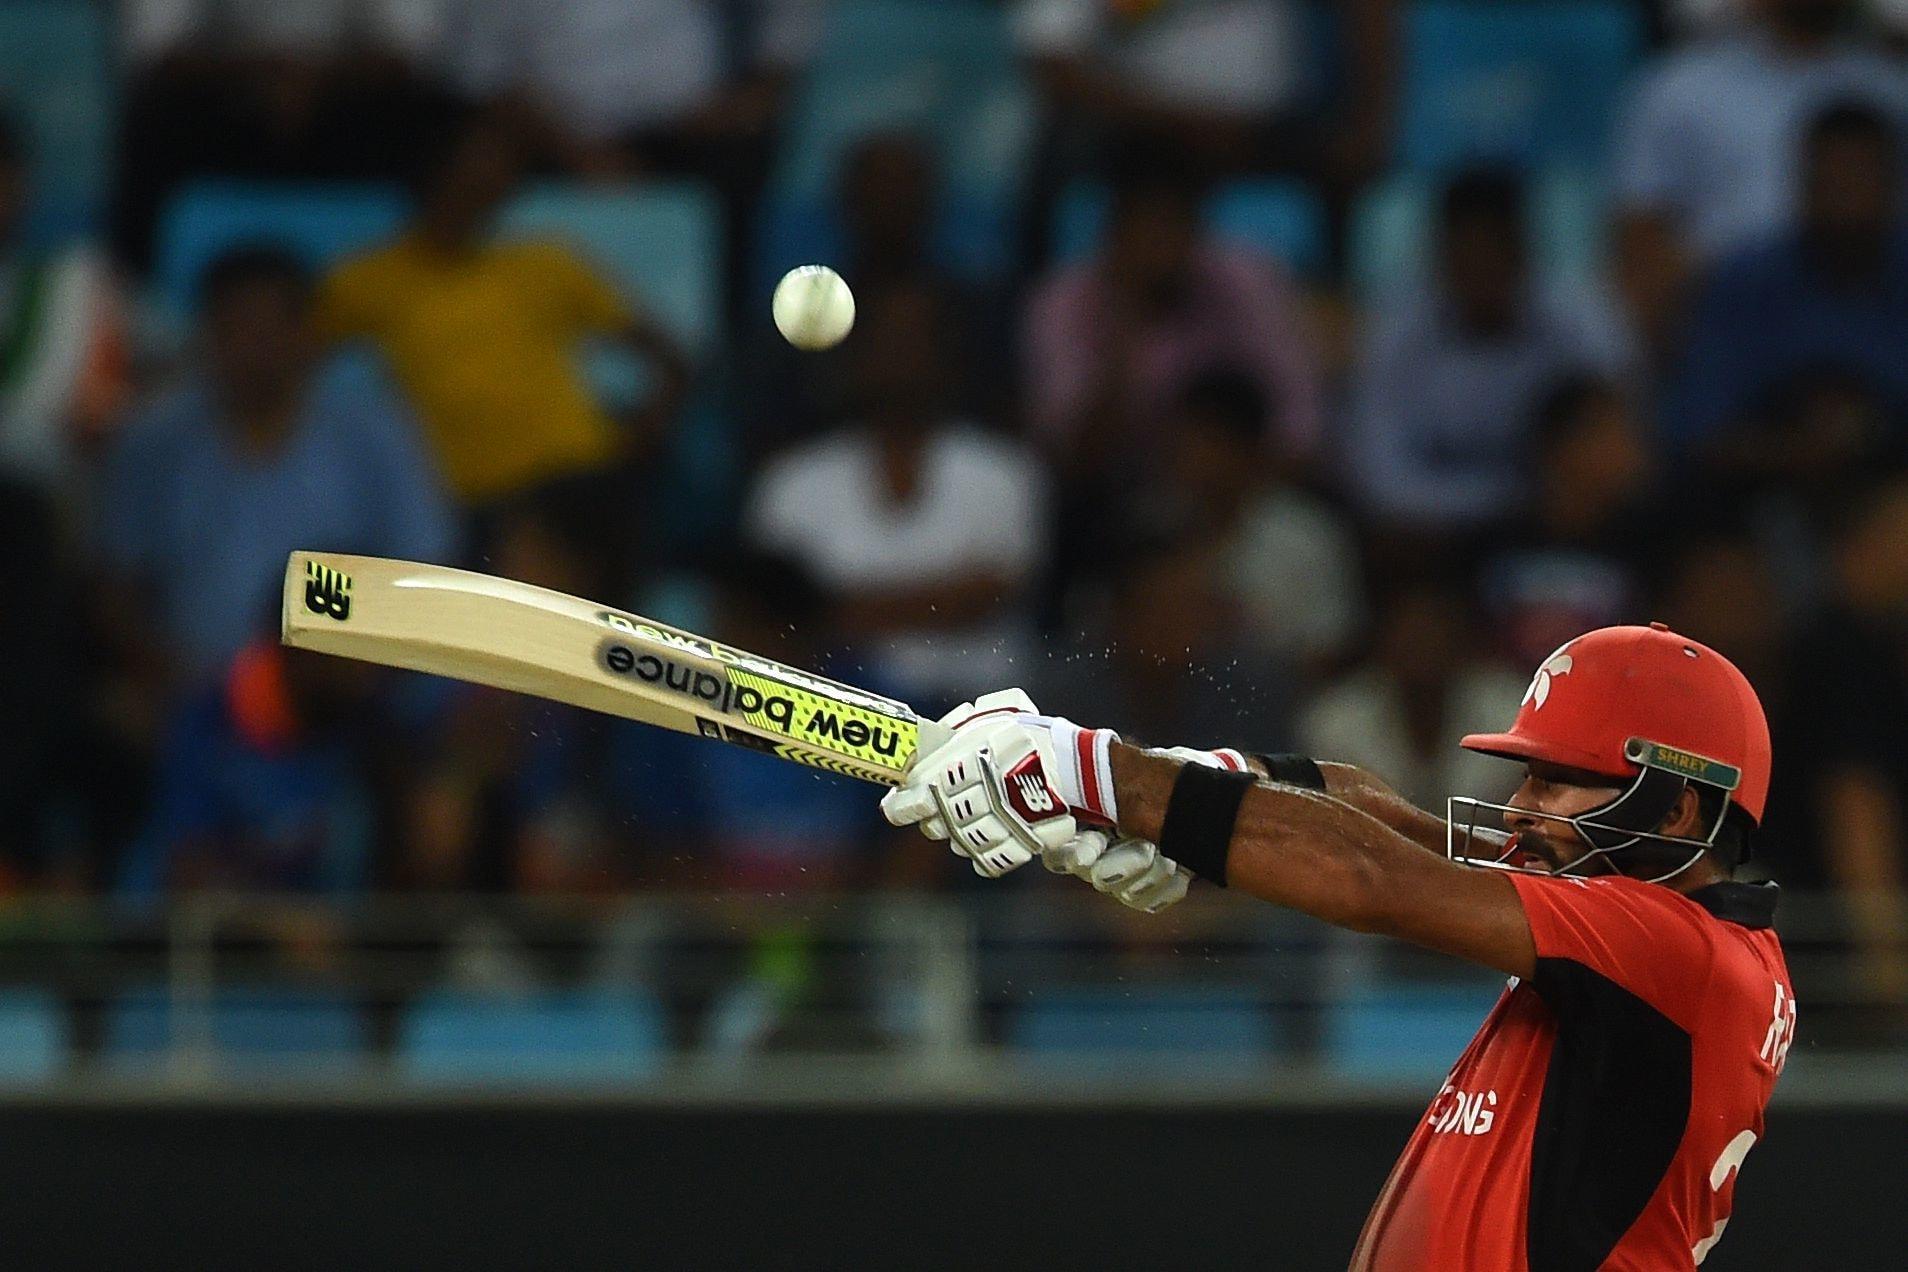 Hong Kong's team captain Anshuman Rath plays a shot during the one day international (ODI) Asia Cup cricket match between Hong Kong and India at the Dubai International Cricket Stadium. —AFP